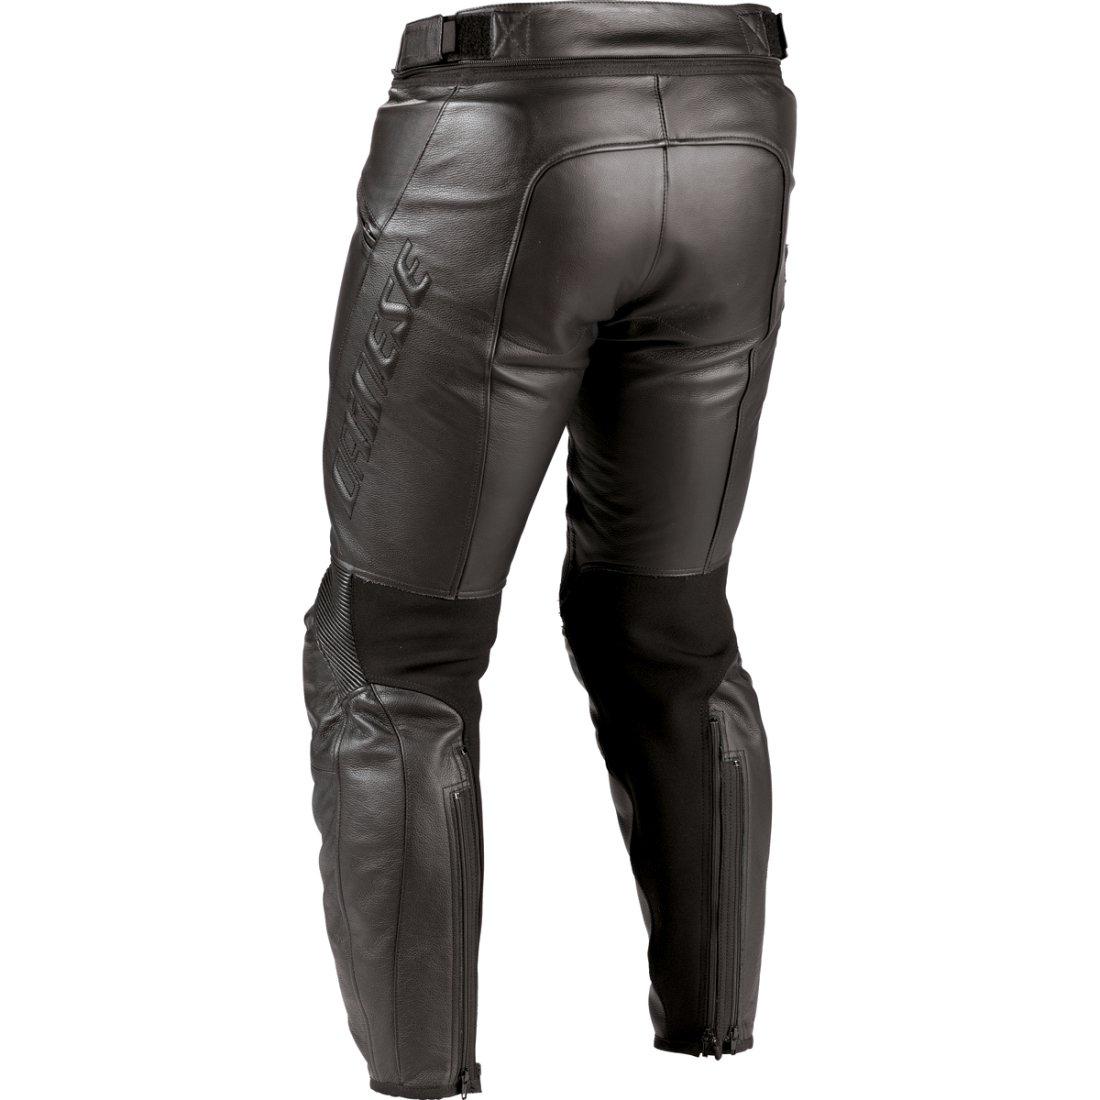 559fd7542de9 DAINESE Pony C2 Black Pant · Motocard